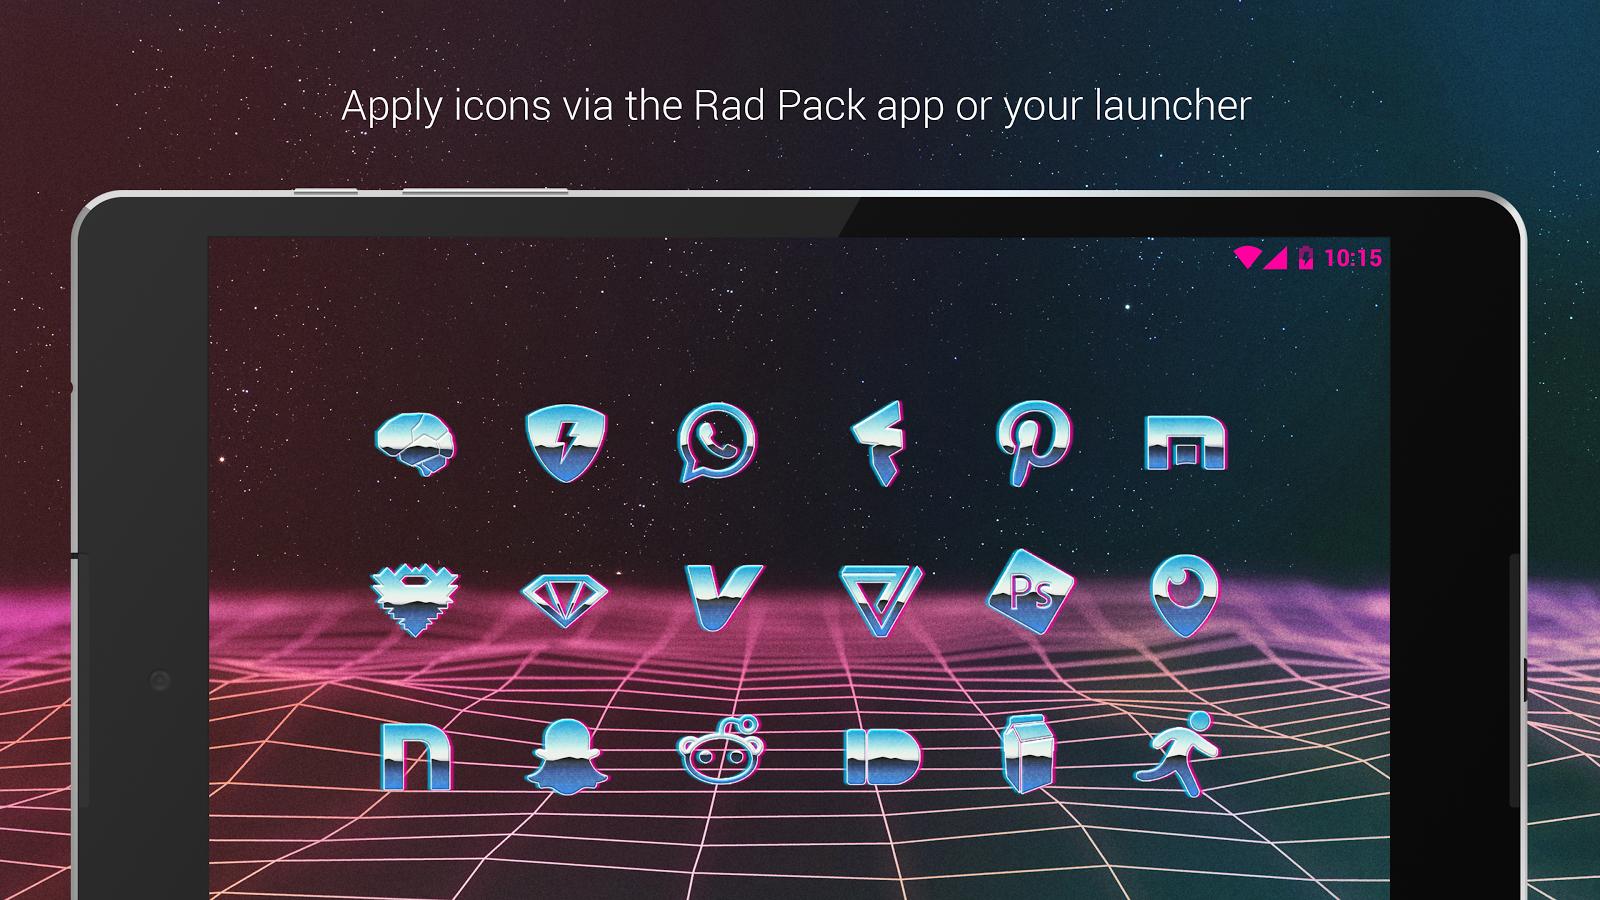 Google themes aesthetic - Rad Pack Free 80 S Theme Screenshot